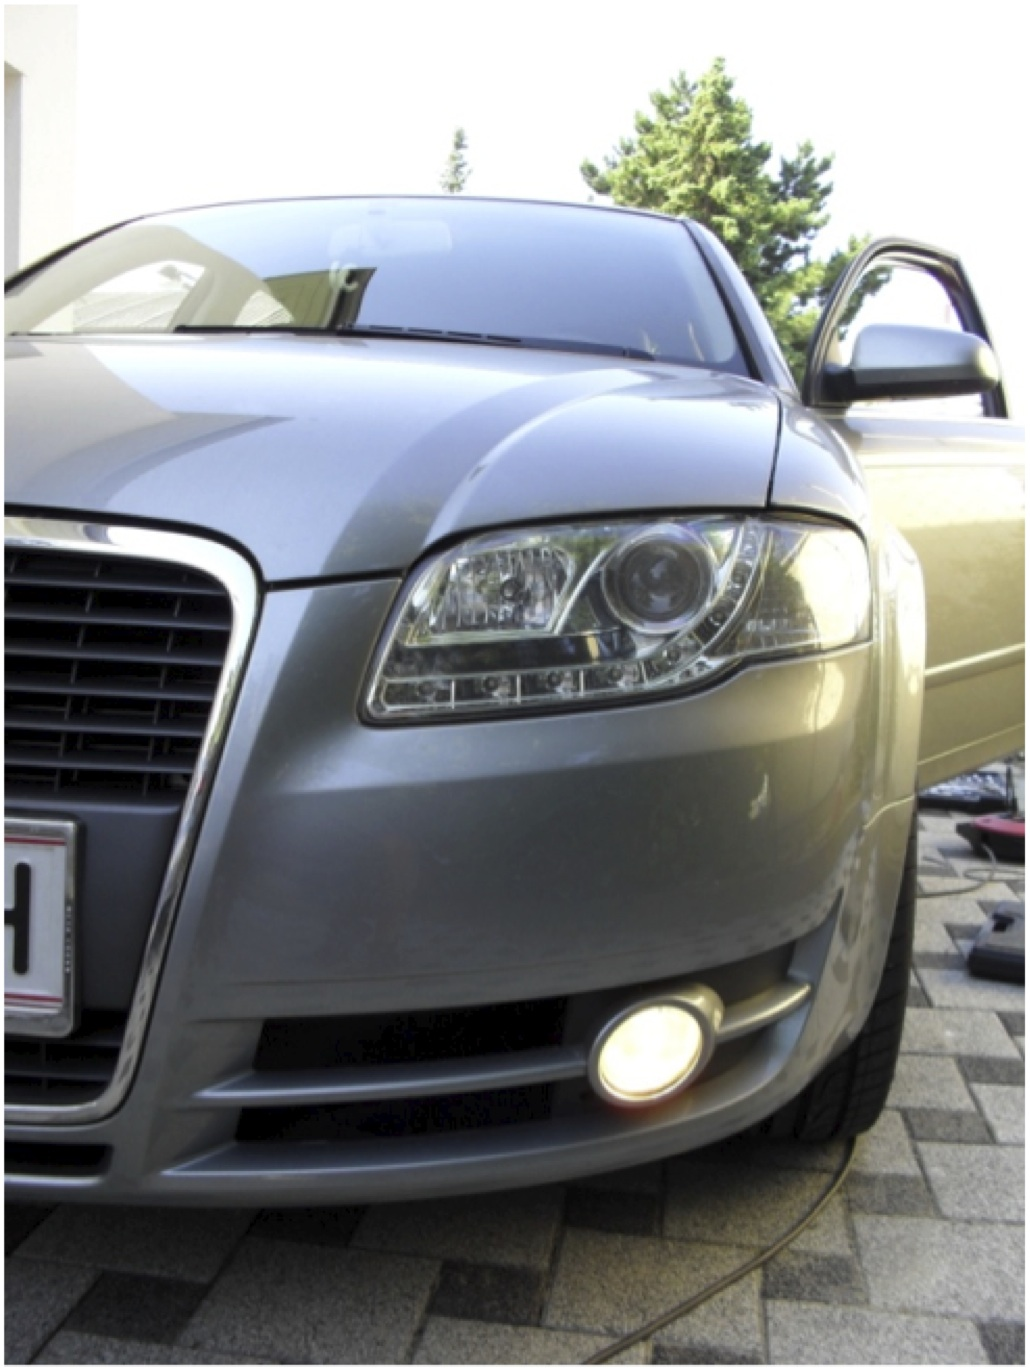 NSW als TFL im B7 - A4-Freunde.COMmunity - Dein Forum zum Thema Audi A4